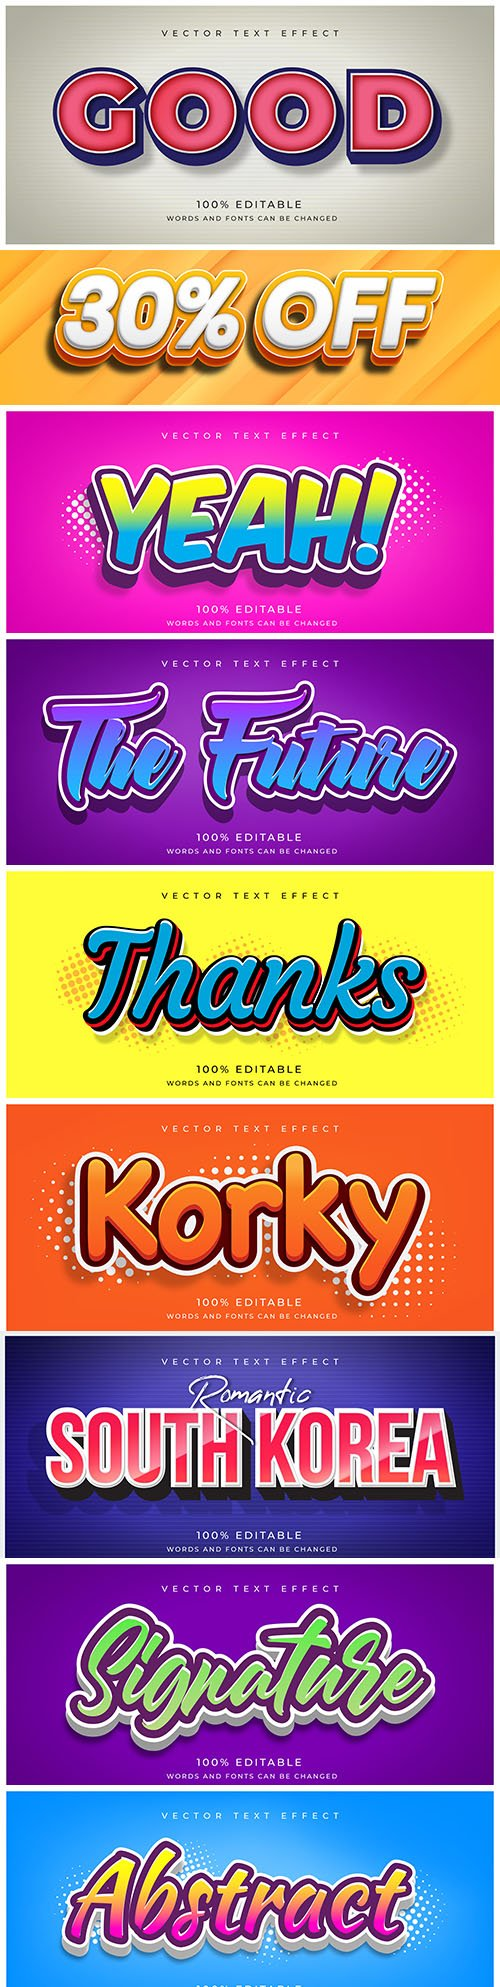 Editable font effect text collection illustration design 204